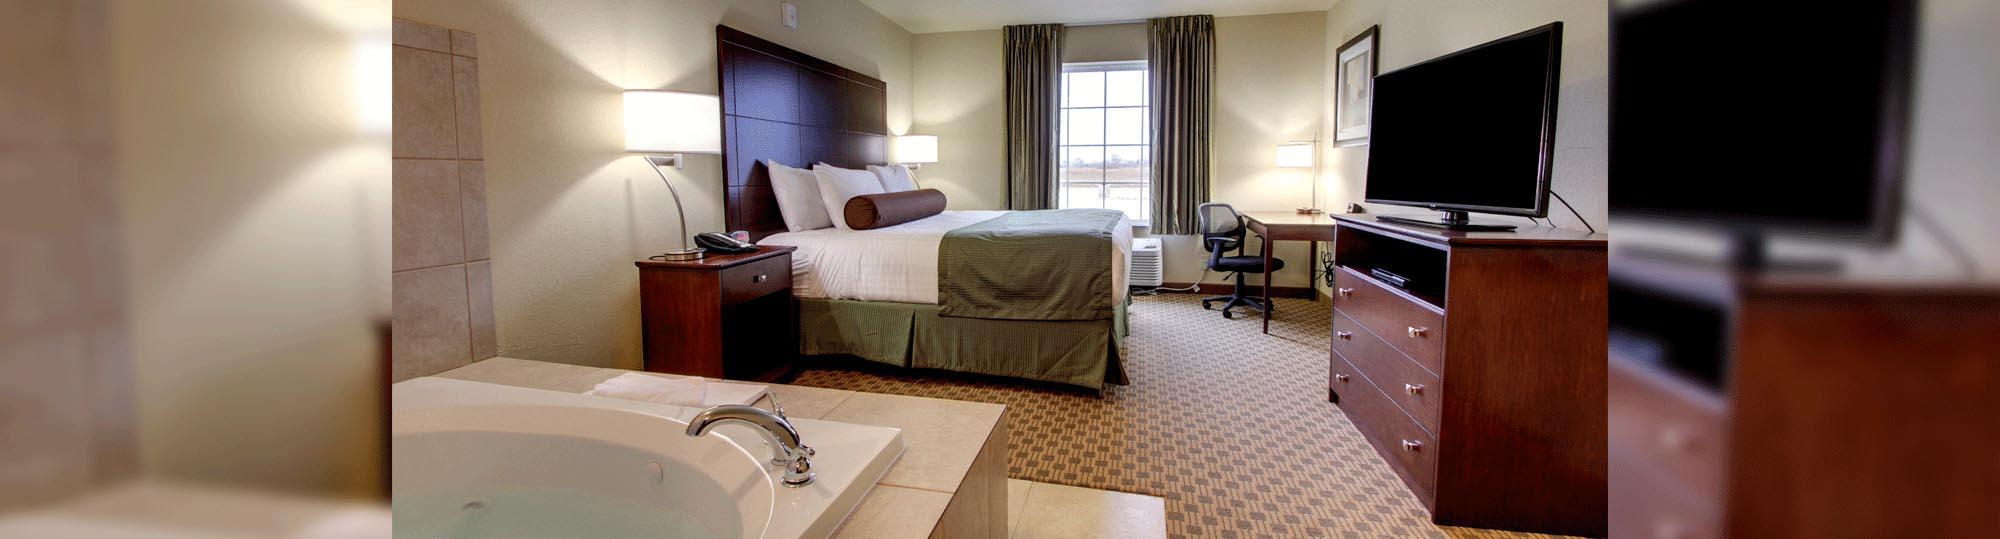 Cobblestone Hotel and Suites Broken Bow